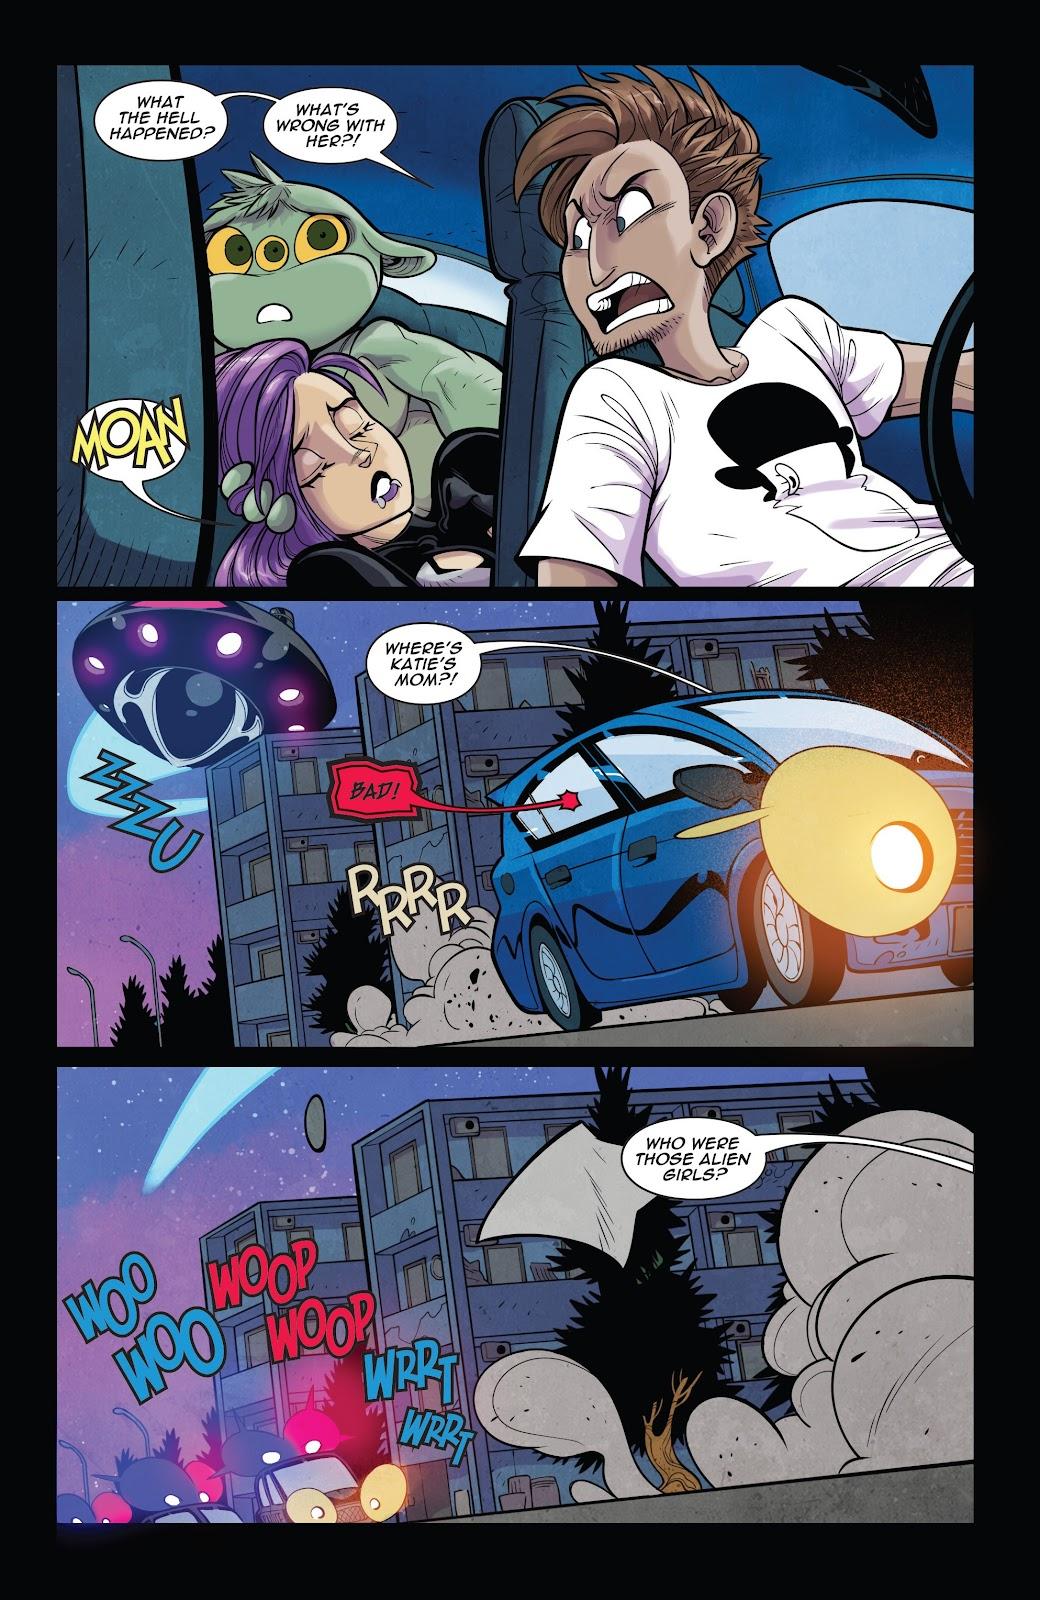 Read online Vampblade Season 3 comic -  Issue #11 - 5